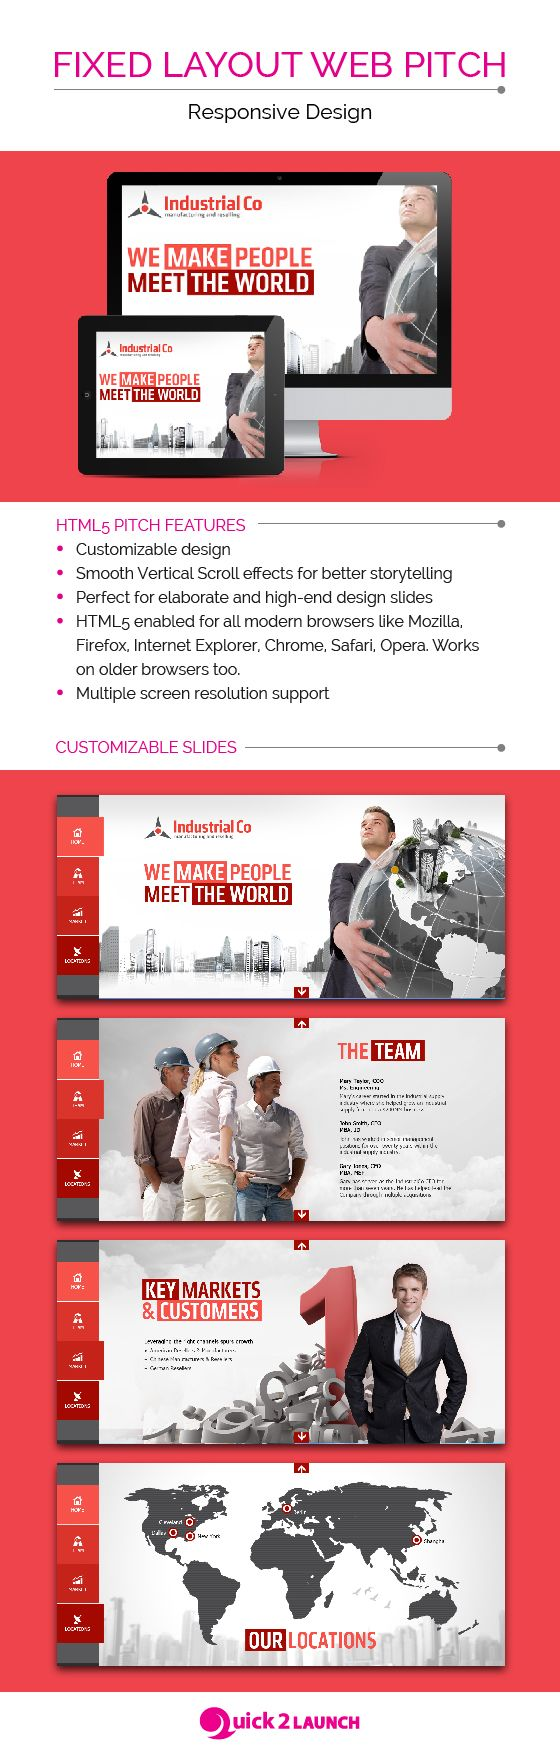 Responsive presentation design template, ideal for online pitches. Presentation design layout. Inspirational presentation design samples.  Visit us at: www.sodapopmedia.com #PresentationDesign #Presentation #Multimedia #Interactive